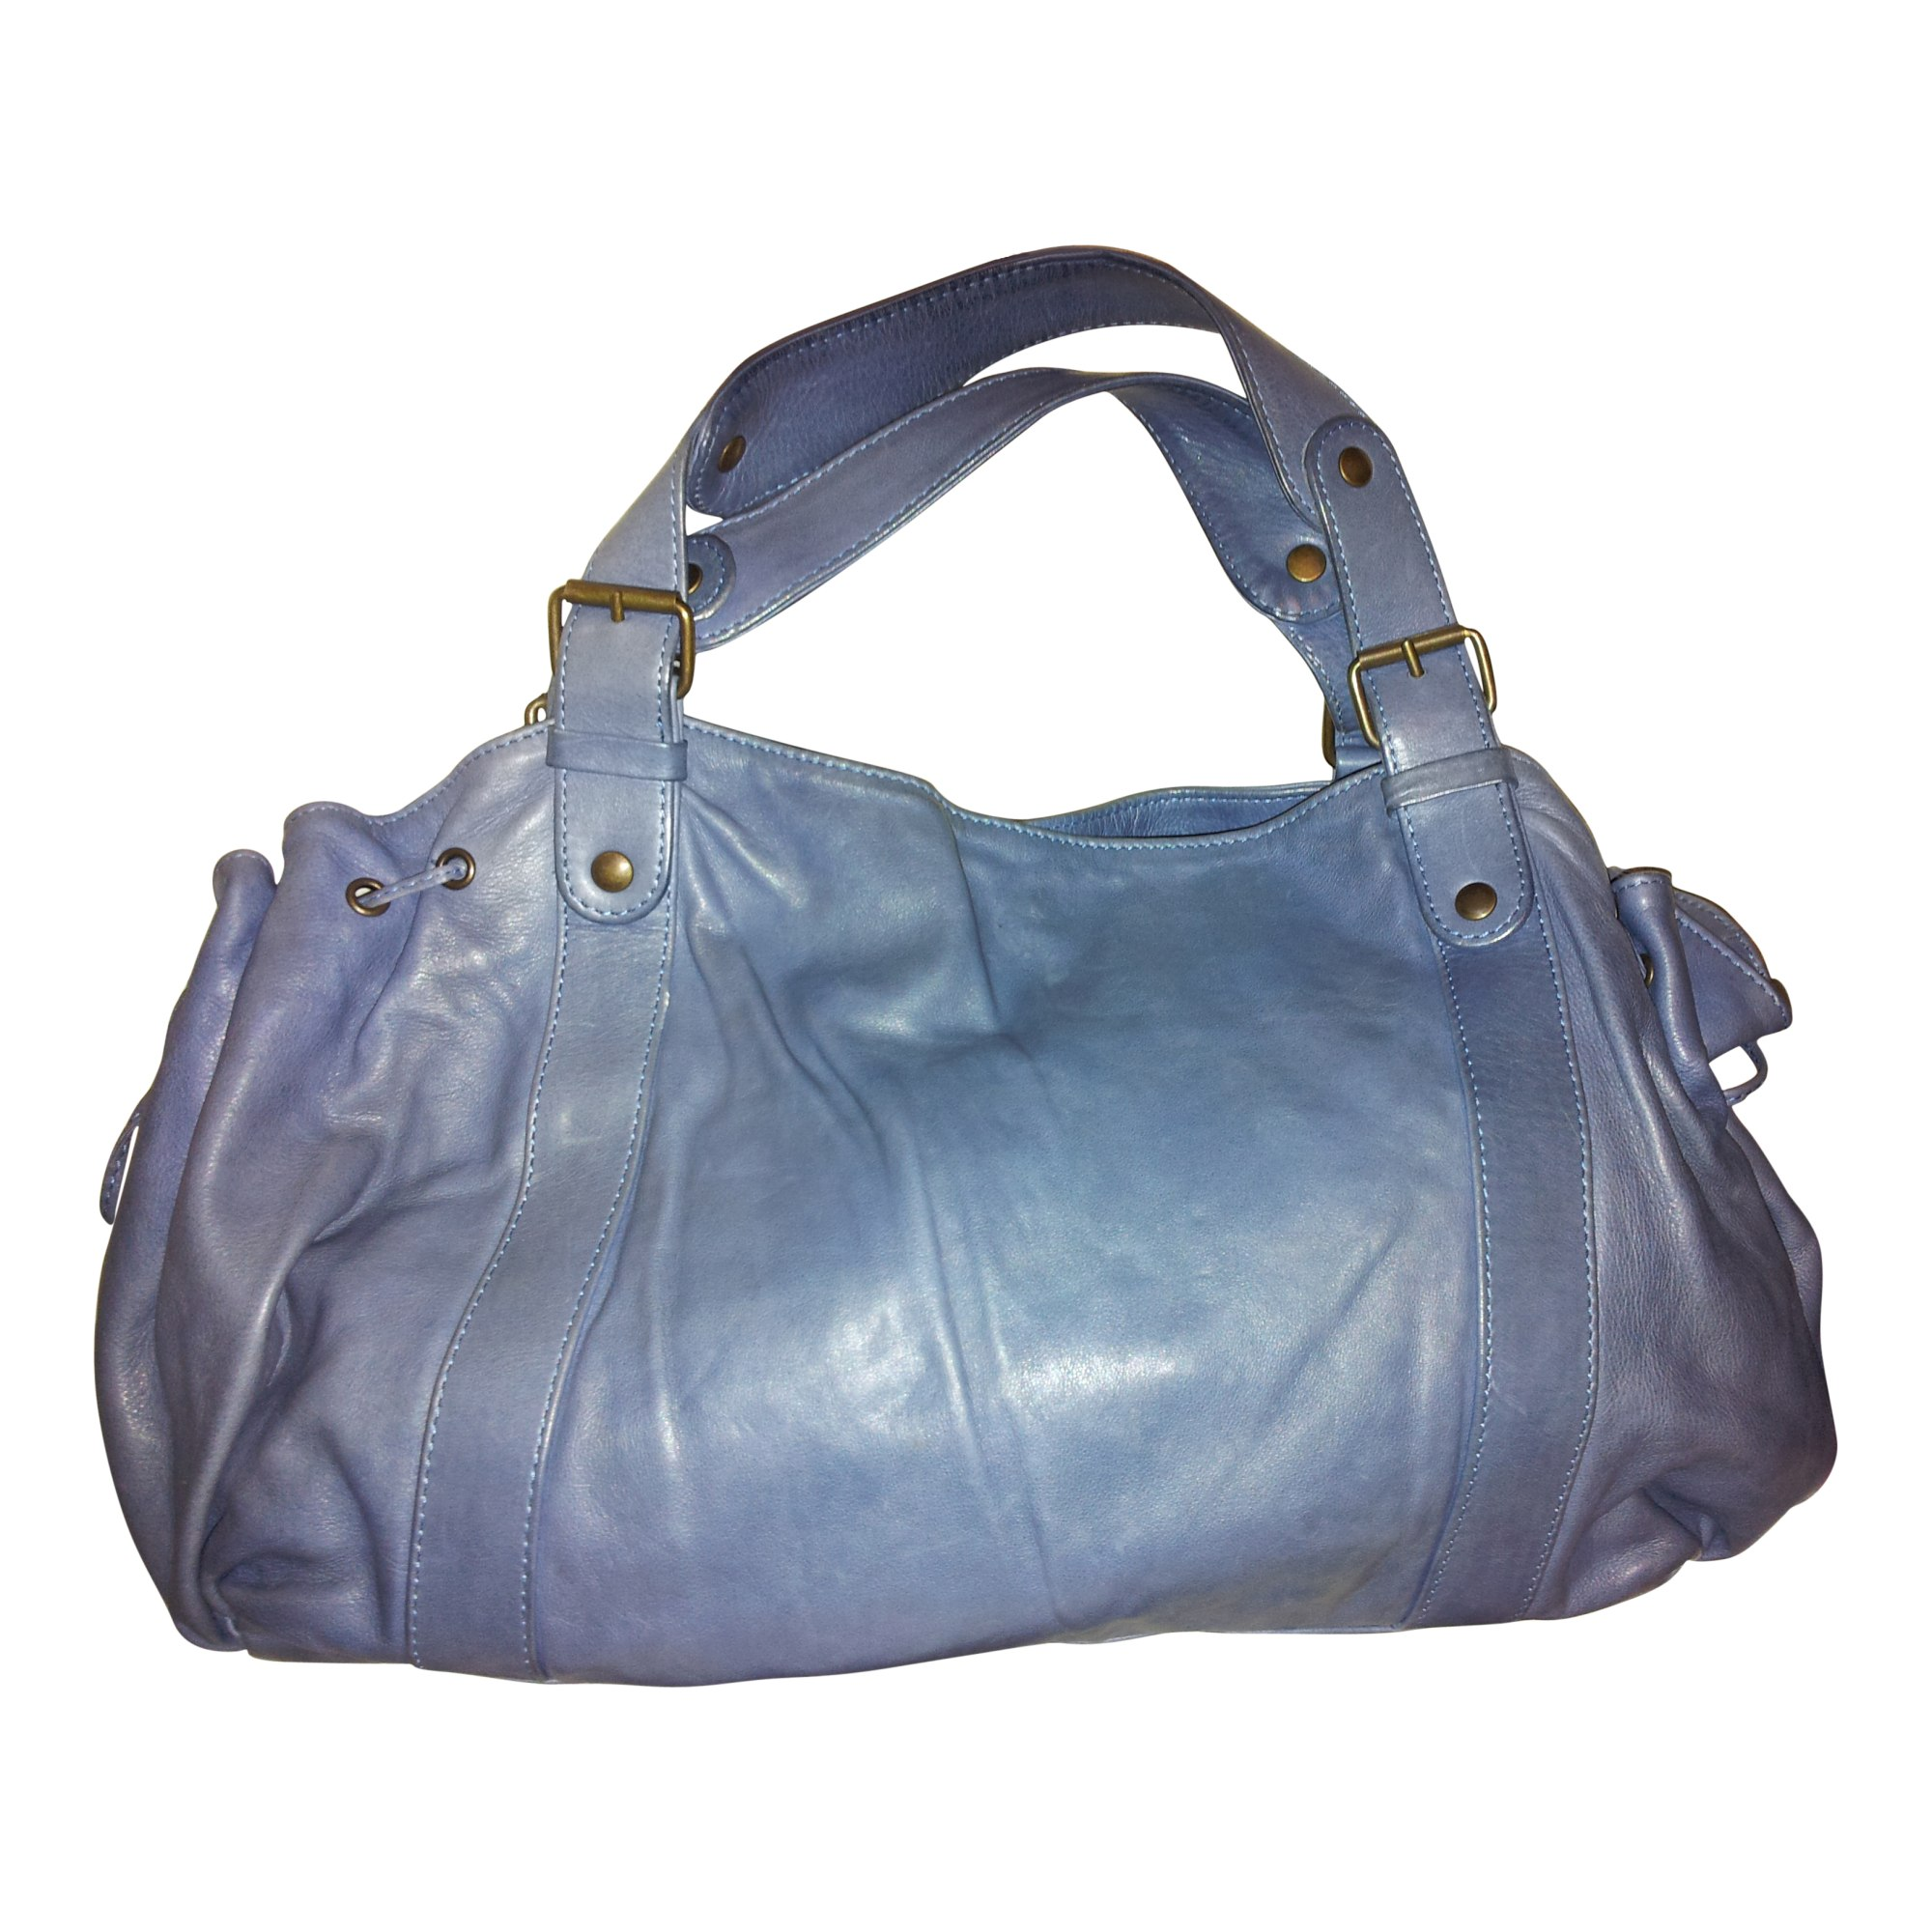 68f401f7ee3d Sac à main en cuir GERARD DAREL Bleu, bleu marine, bleu turquoise